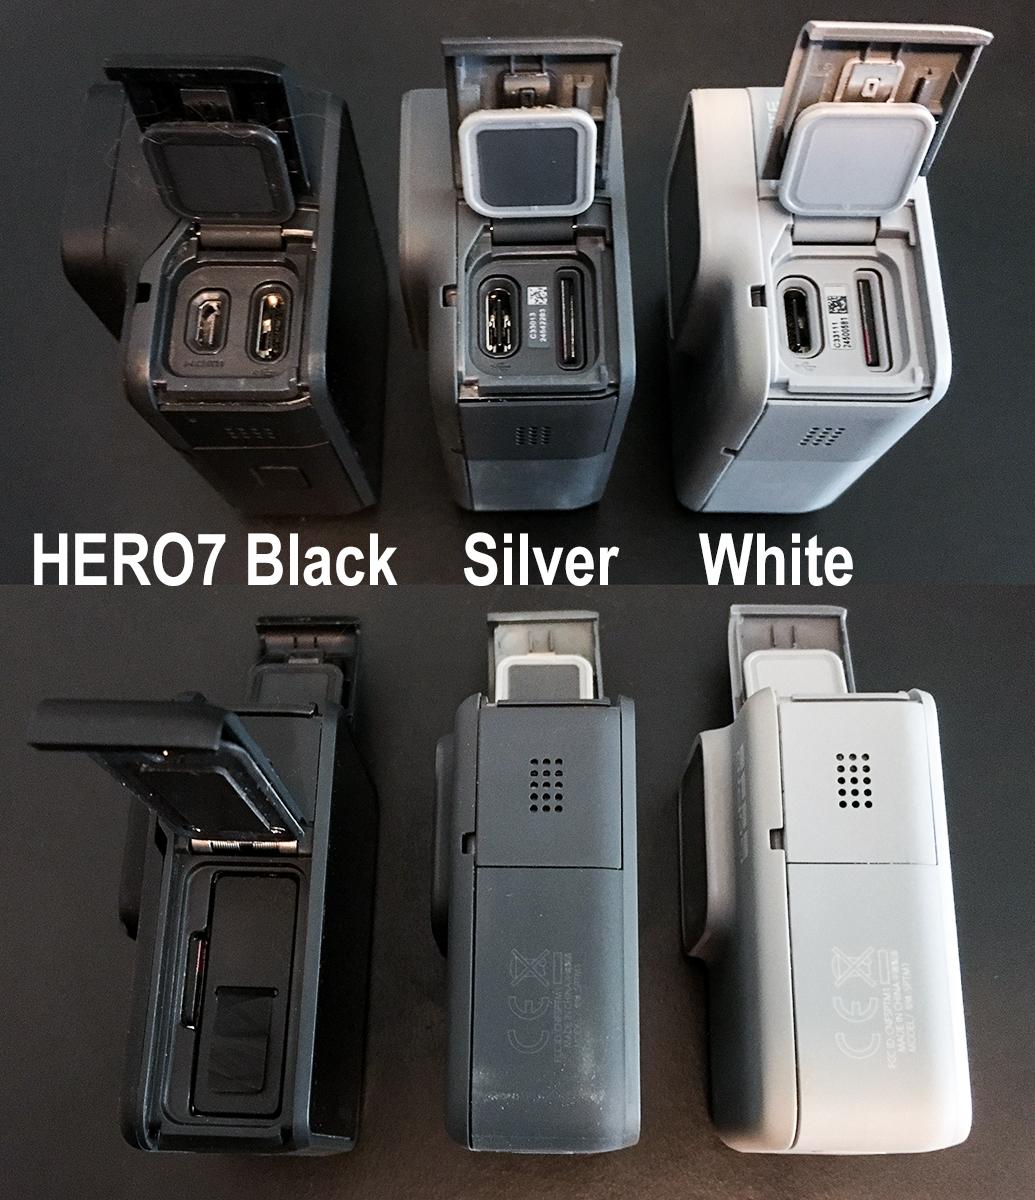 GoPro HERO7 Black, Silver and White Comparisons 4